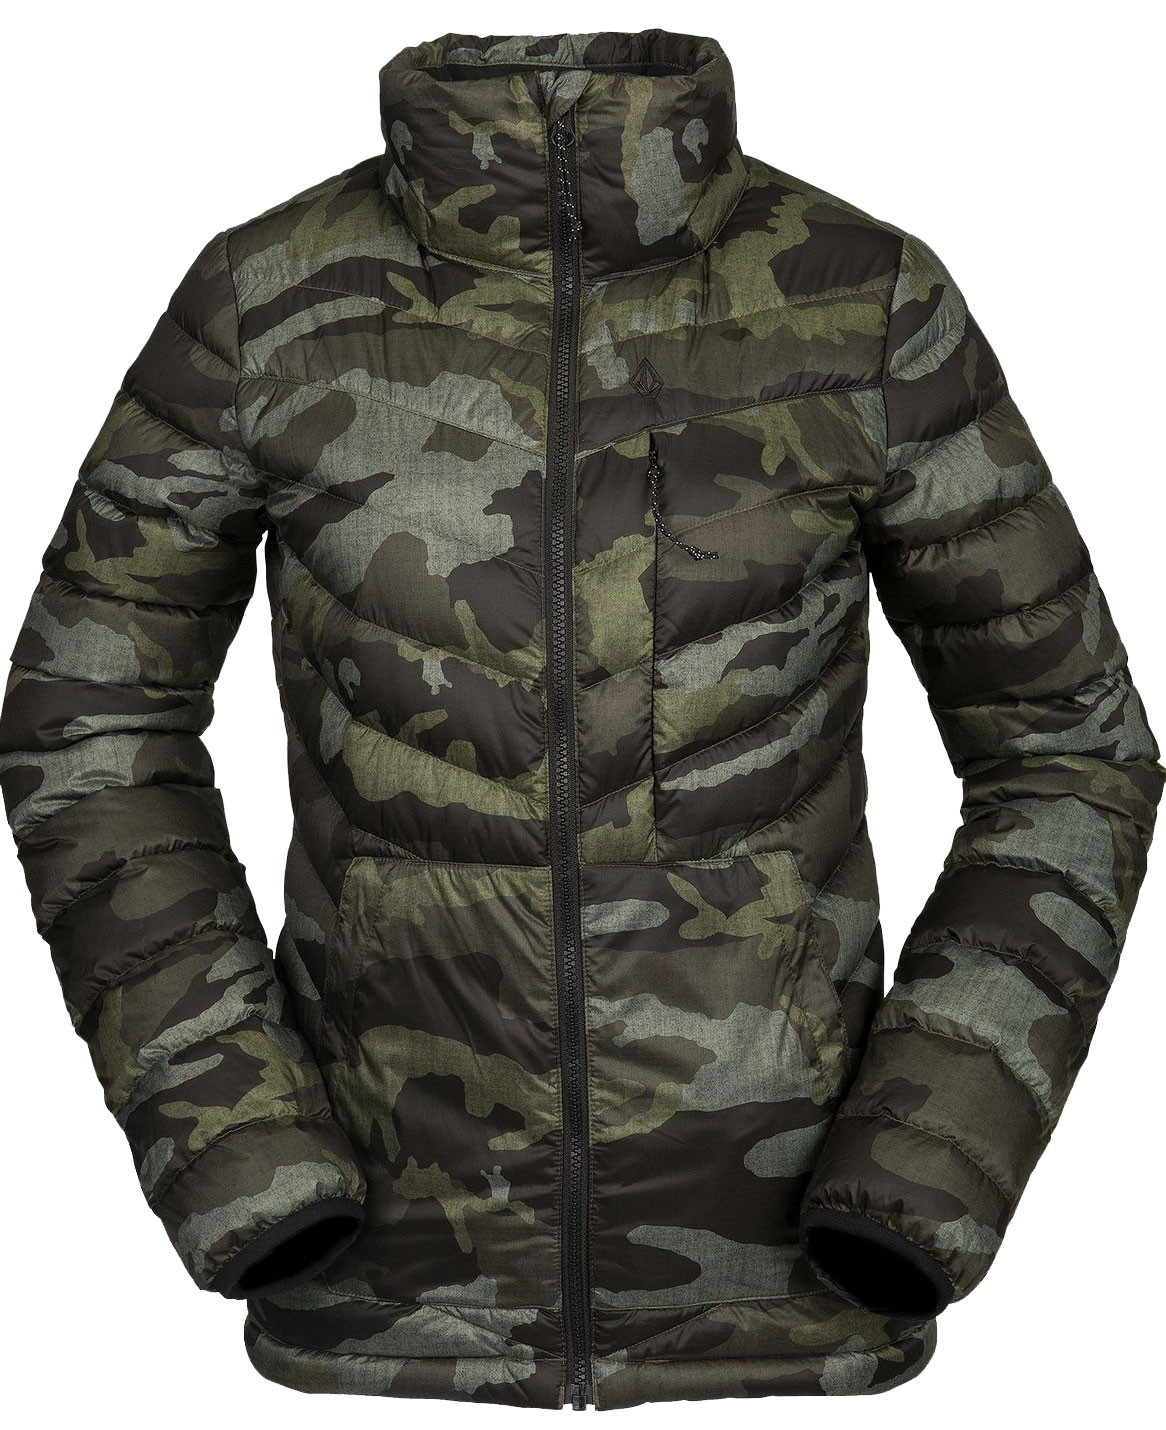 image tia-sd-jacket-jpg